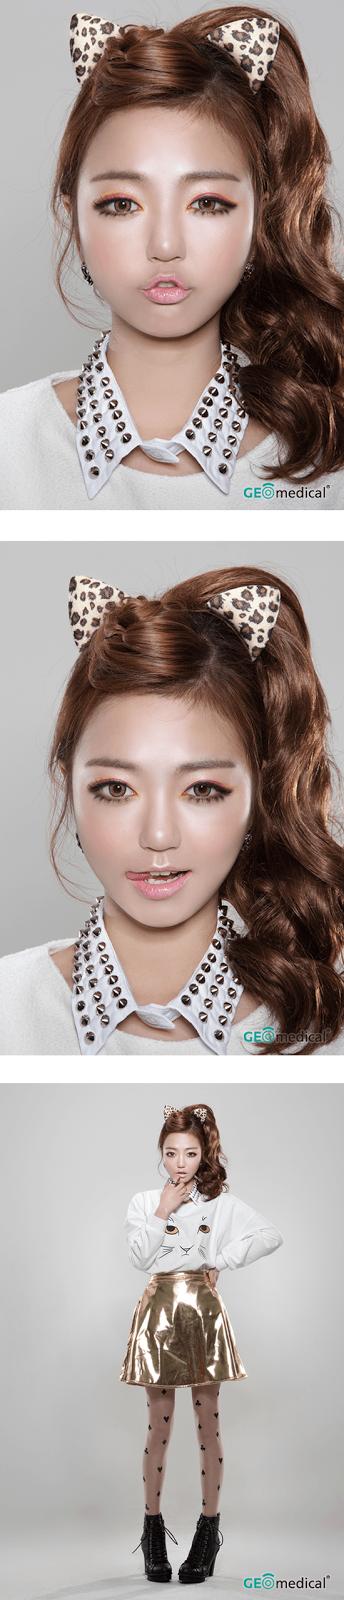 geo holicat barbie cat hazel - Colored Contacts Hazel